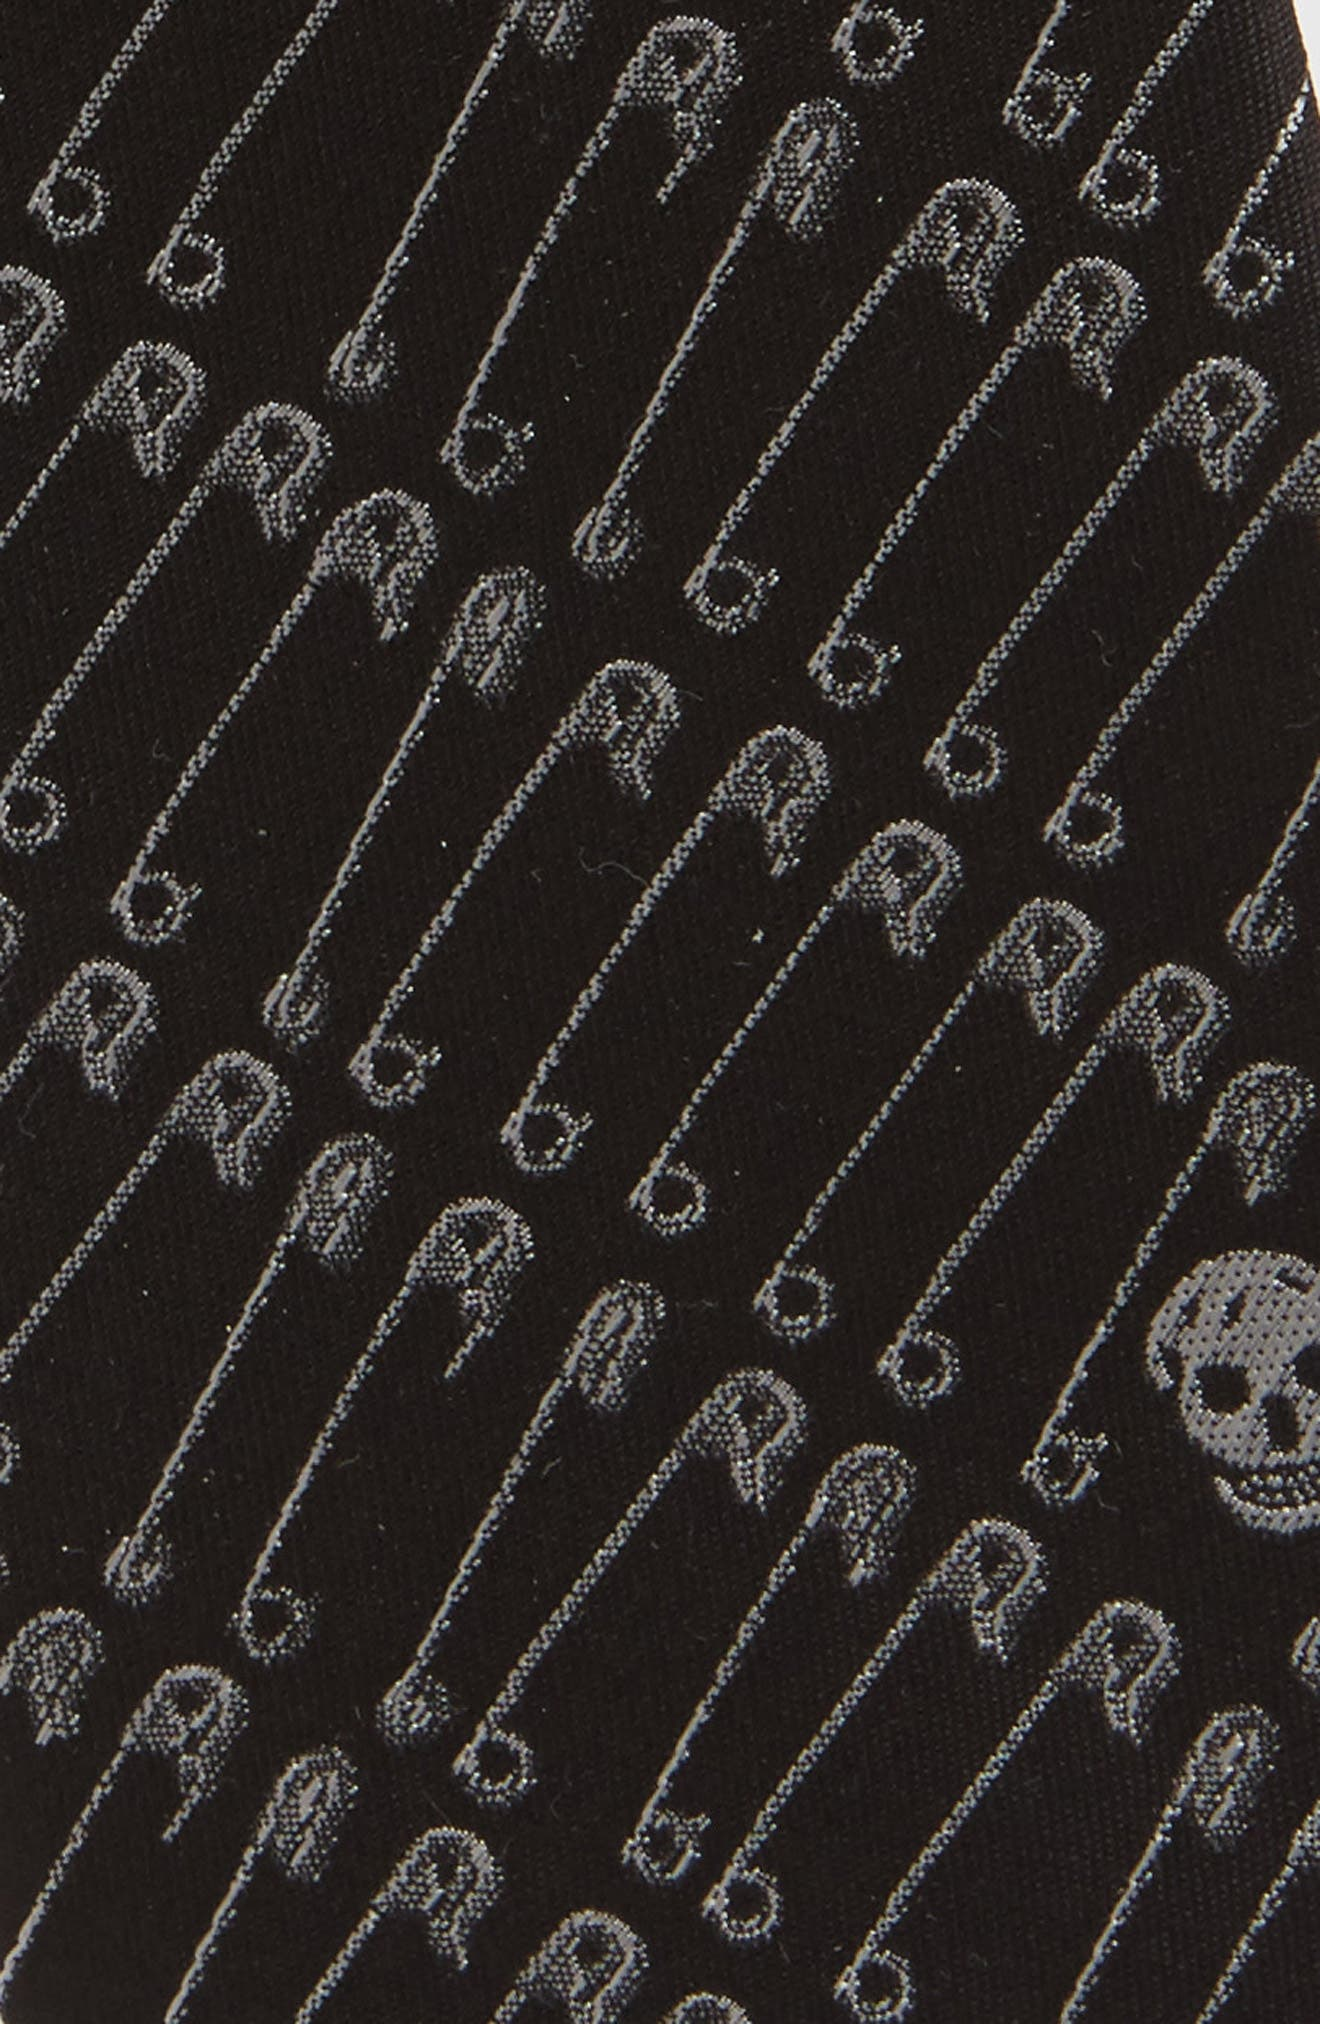 CR Punk Silk Tie,                             Alternate thumbnail 2, color,                             001